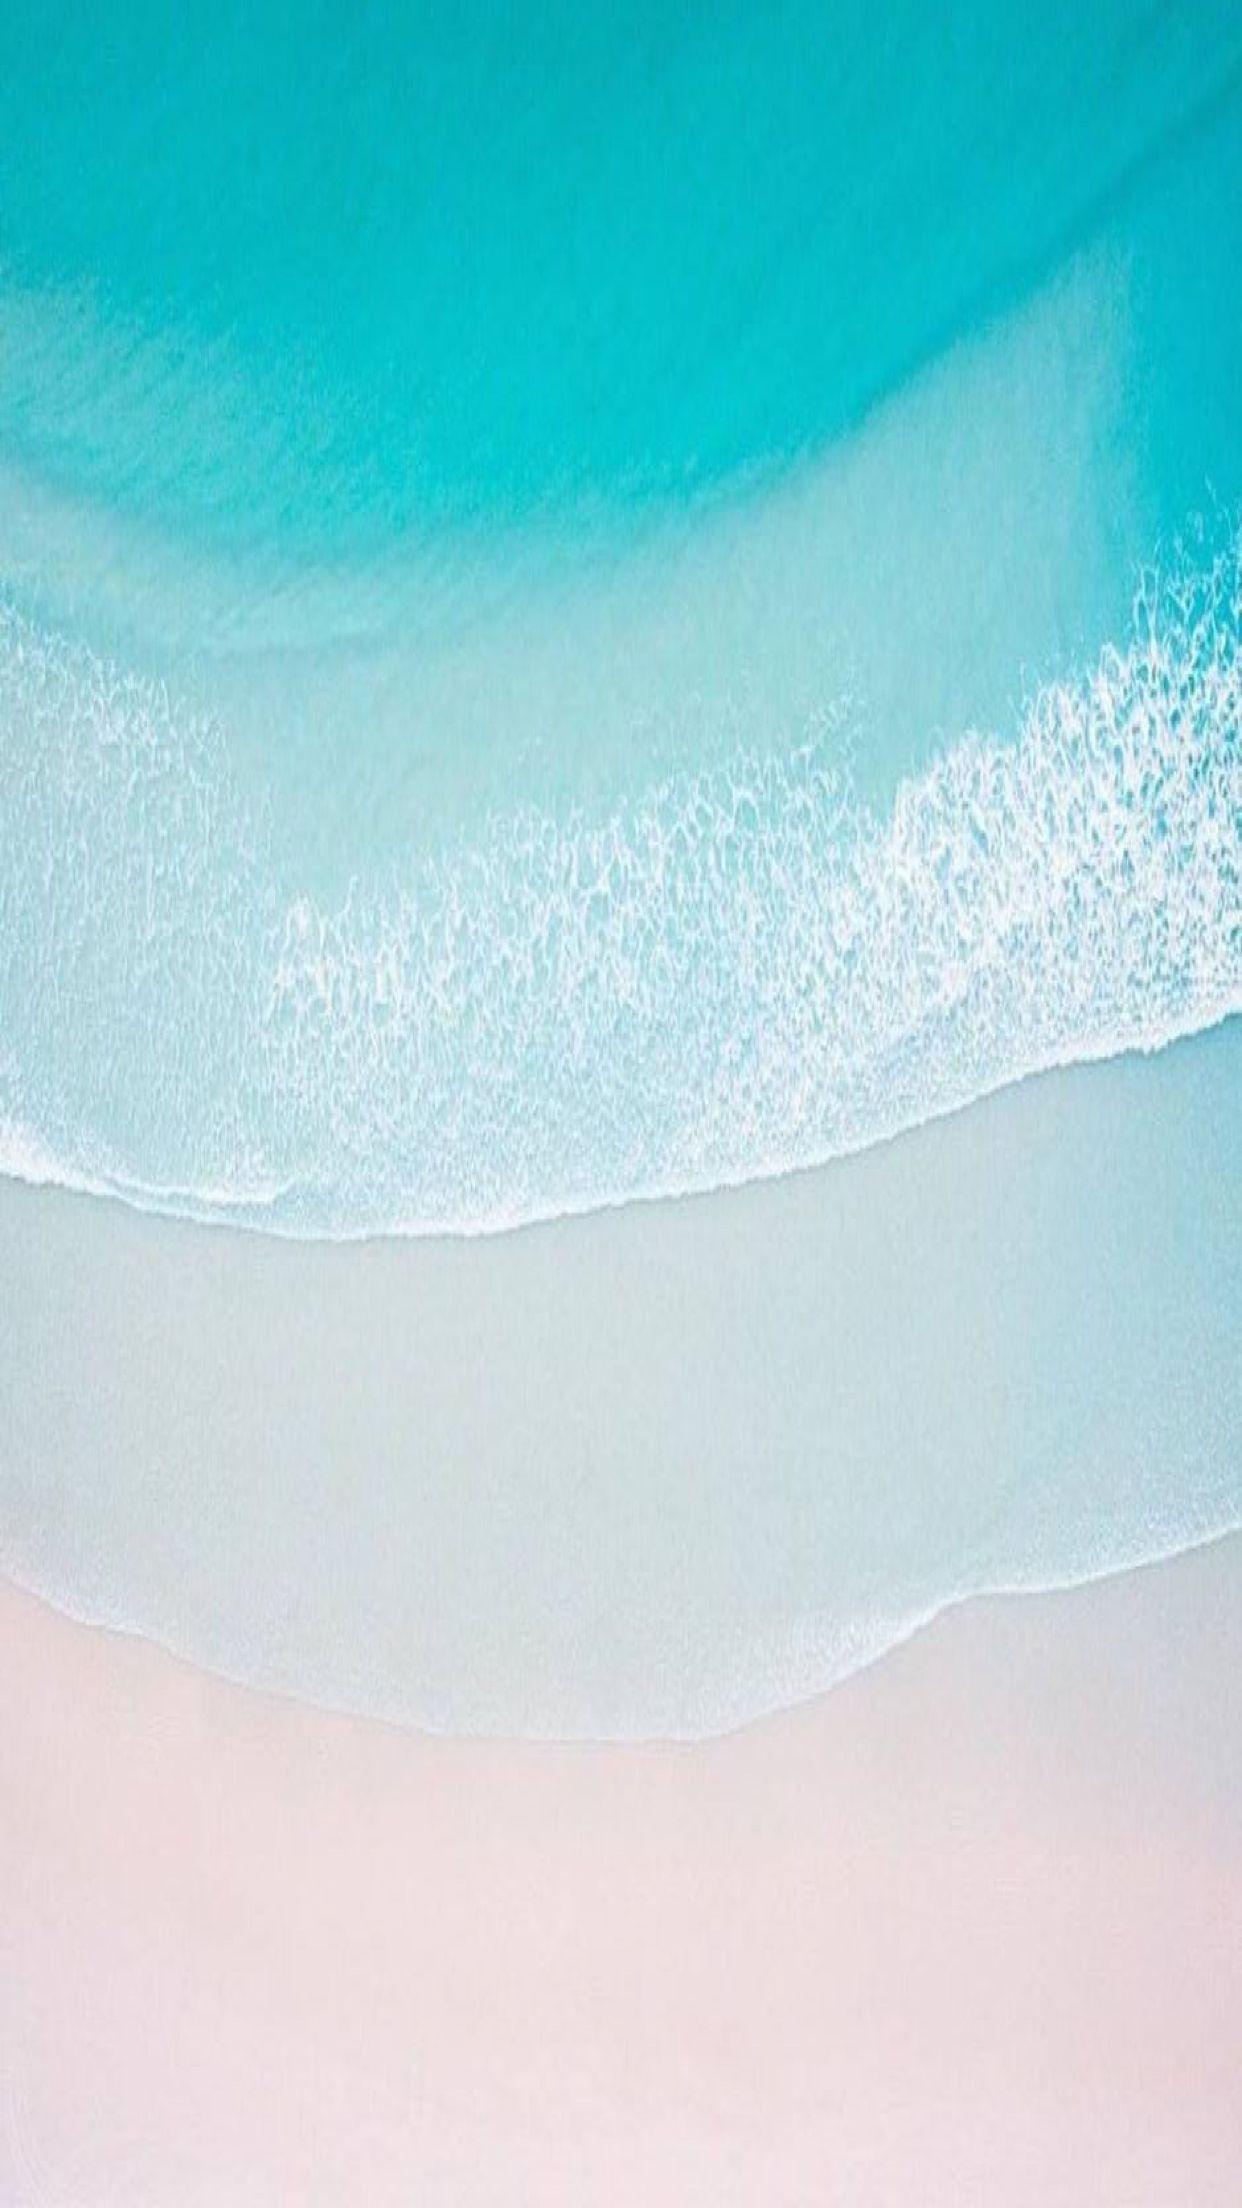 Ocean Iphone 11 Max Wallpapers Wallpaper Cave